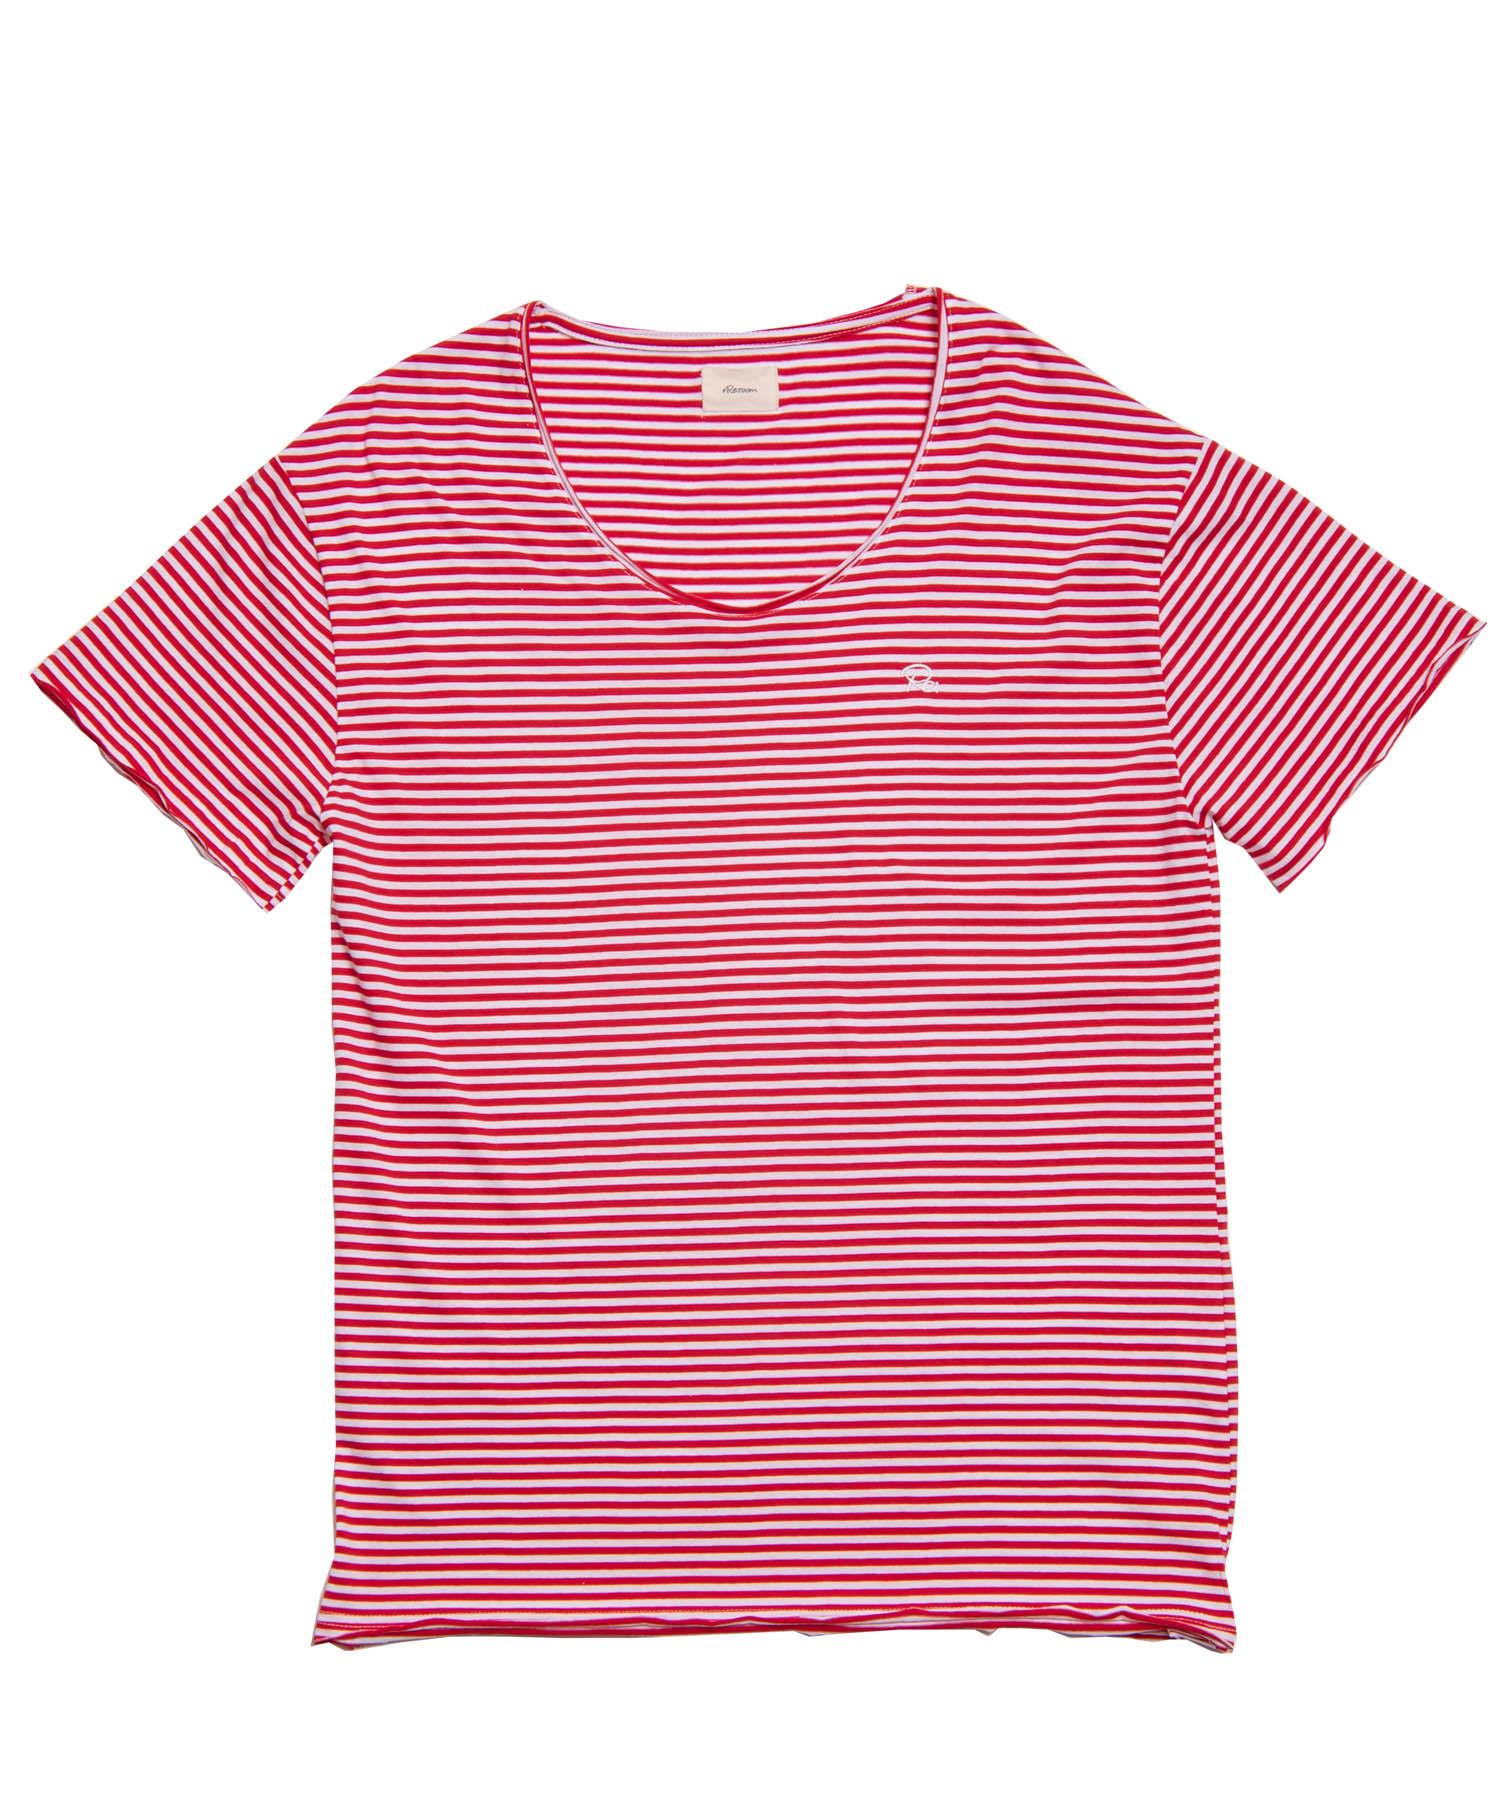 Re: ONE POINT BORDER BIG T-shirt[REC202]